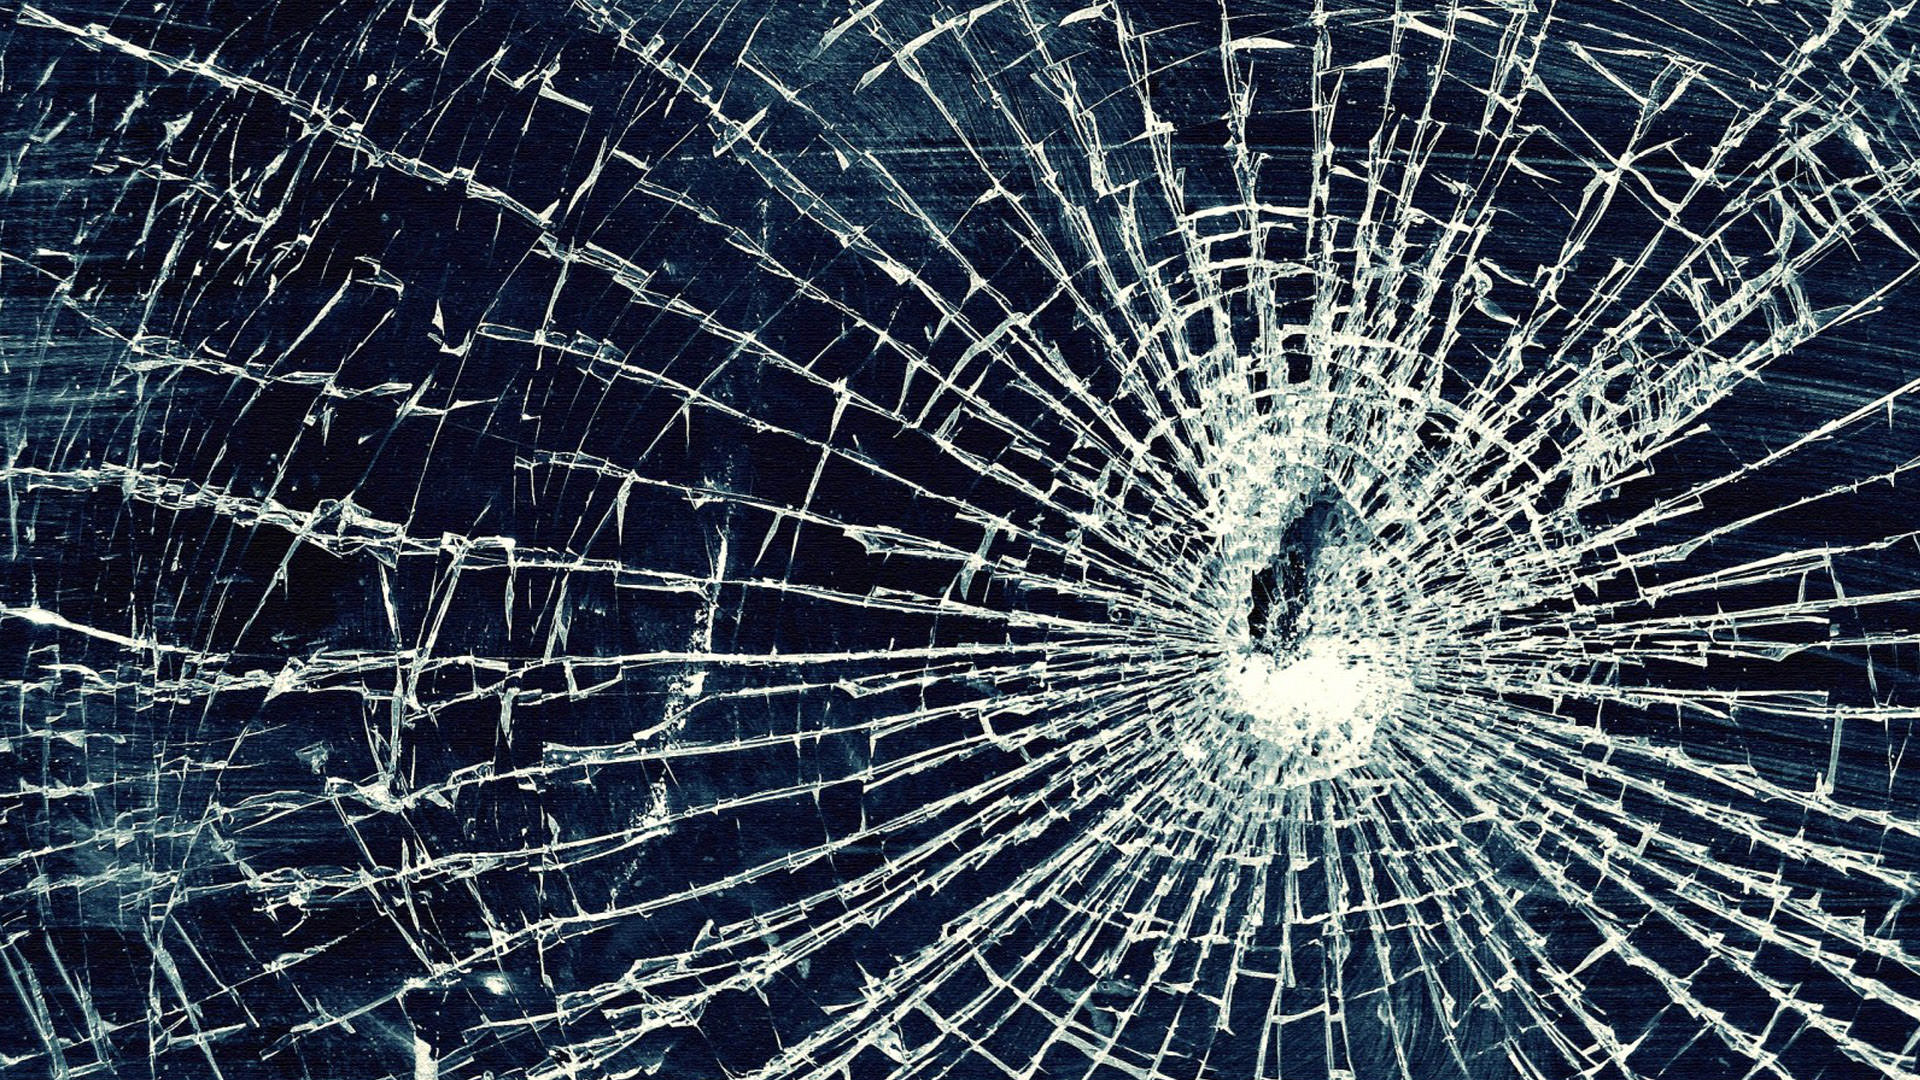 6 broken screen wallpaper prank for iphone, ipod, windows and mac